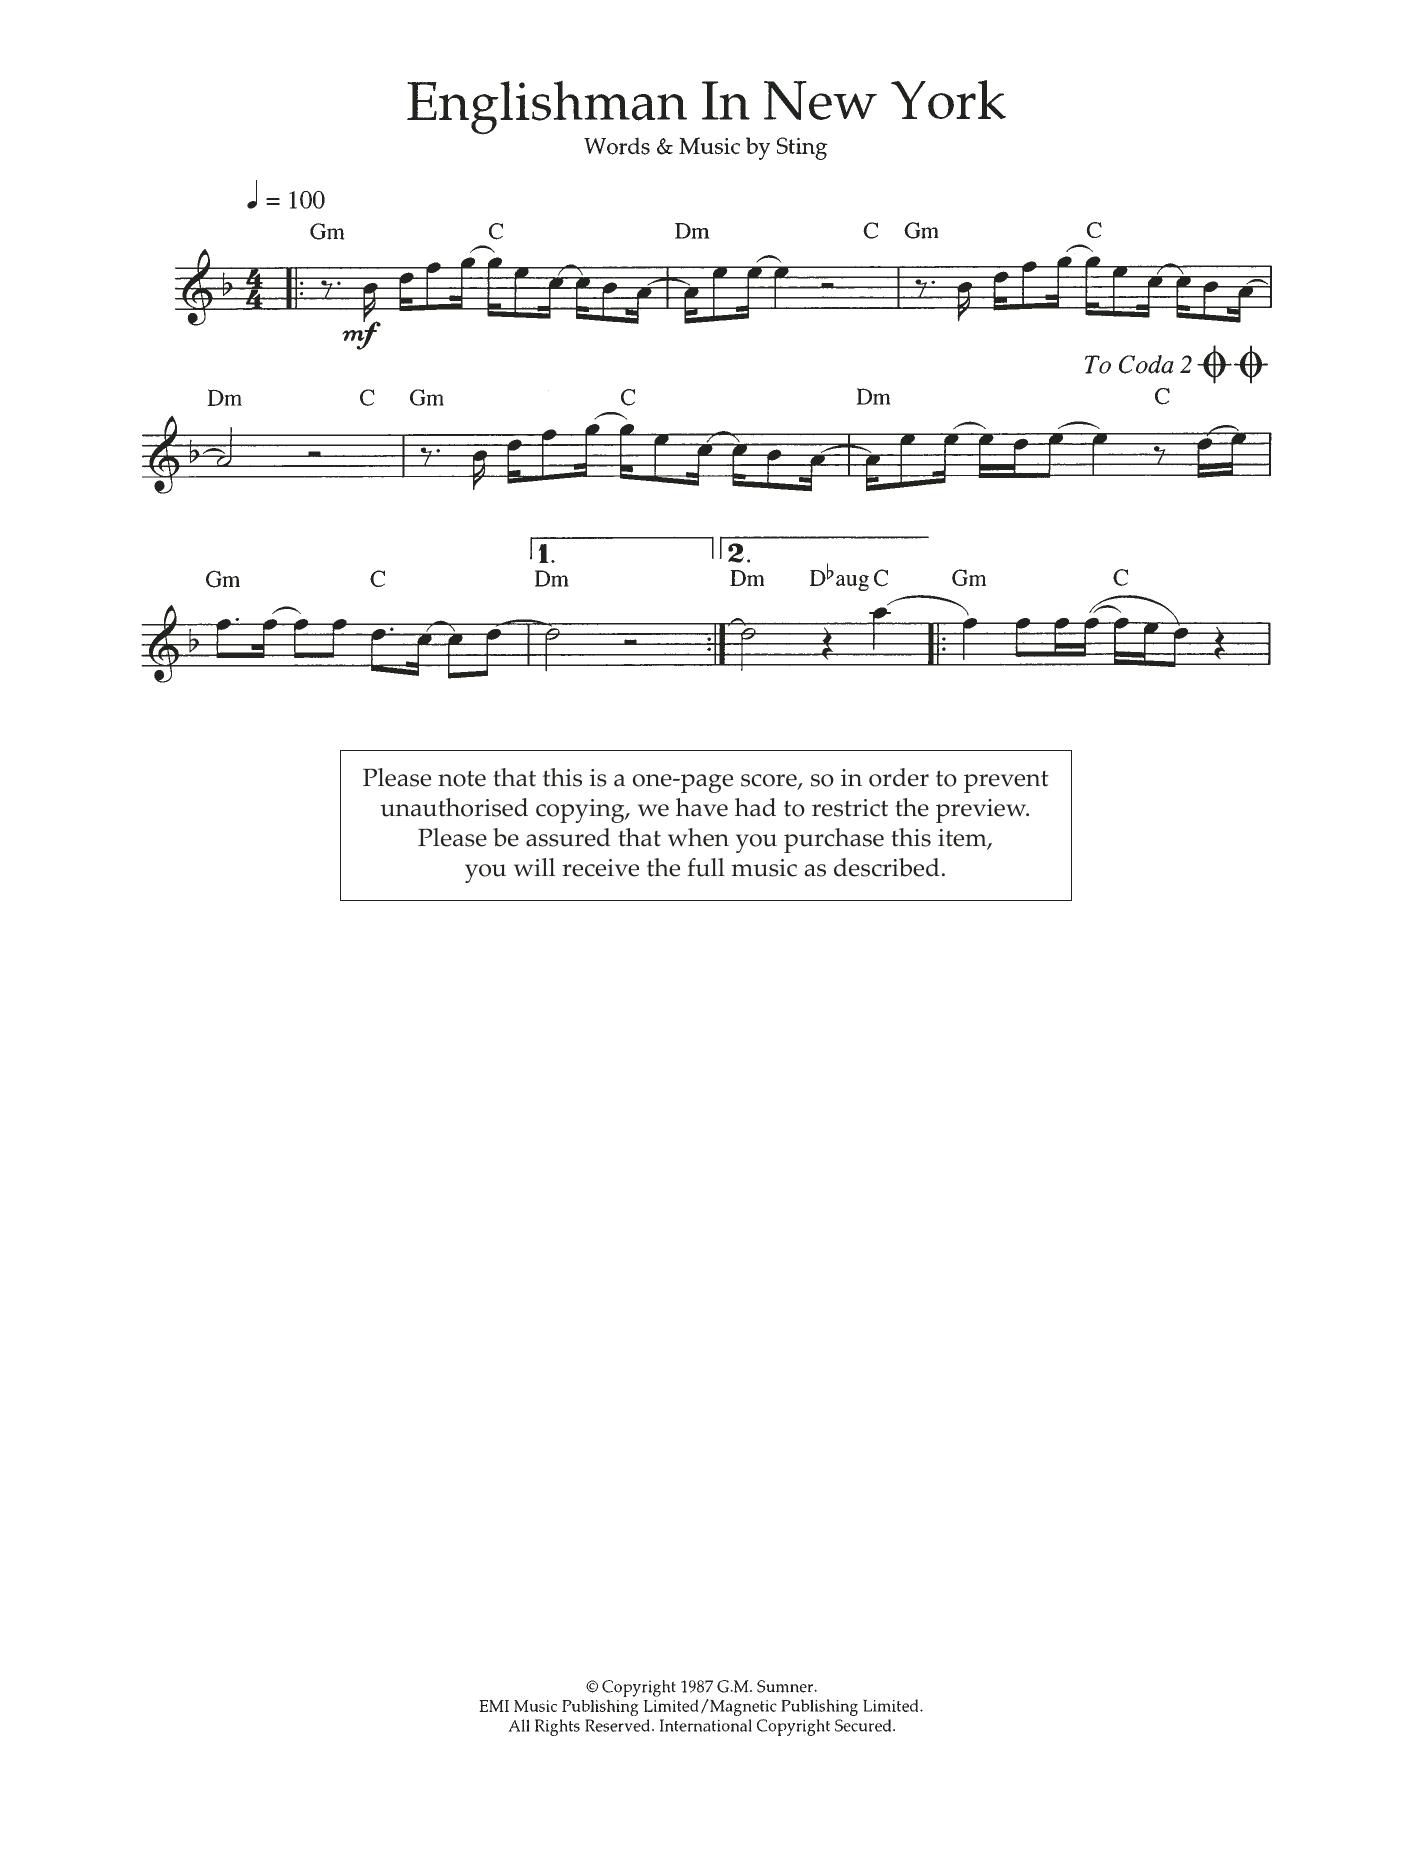 Englishman In New York Sheet Music